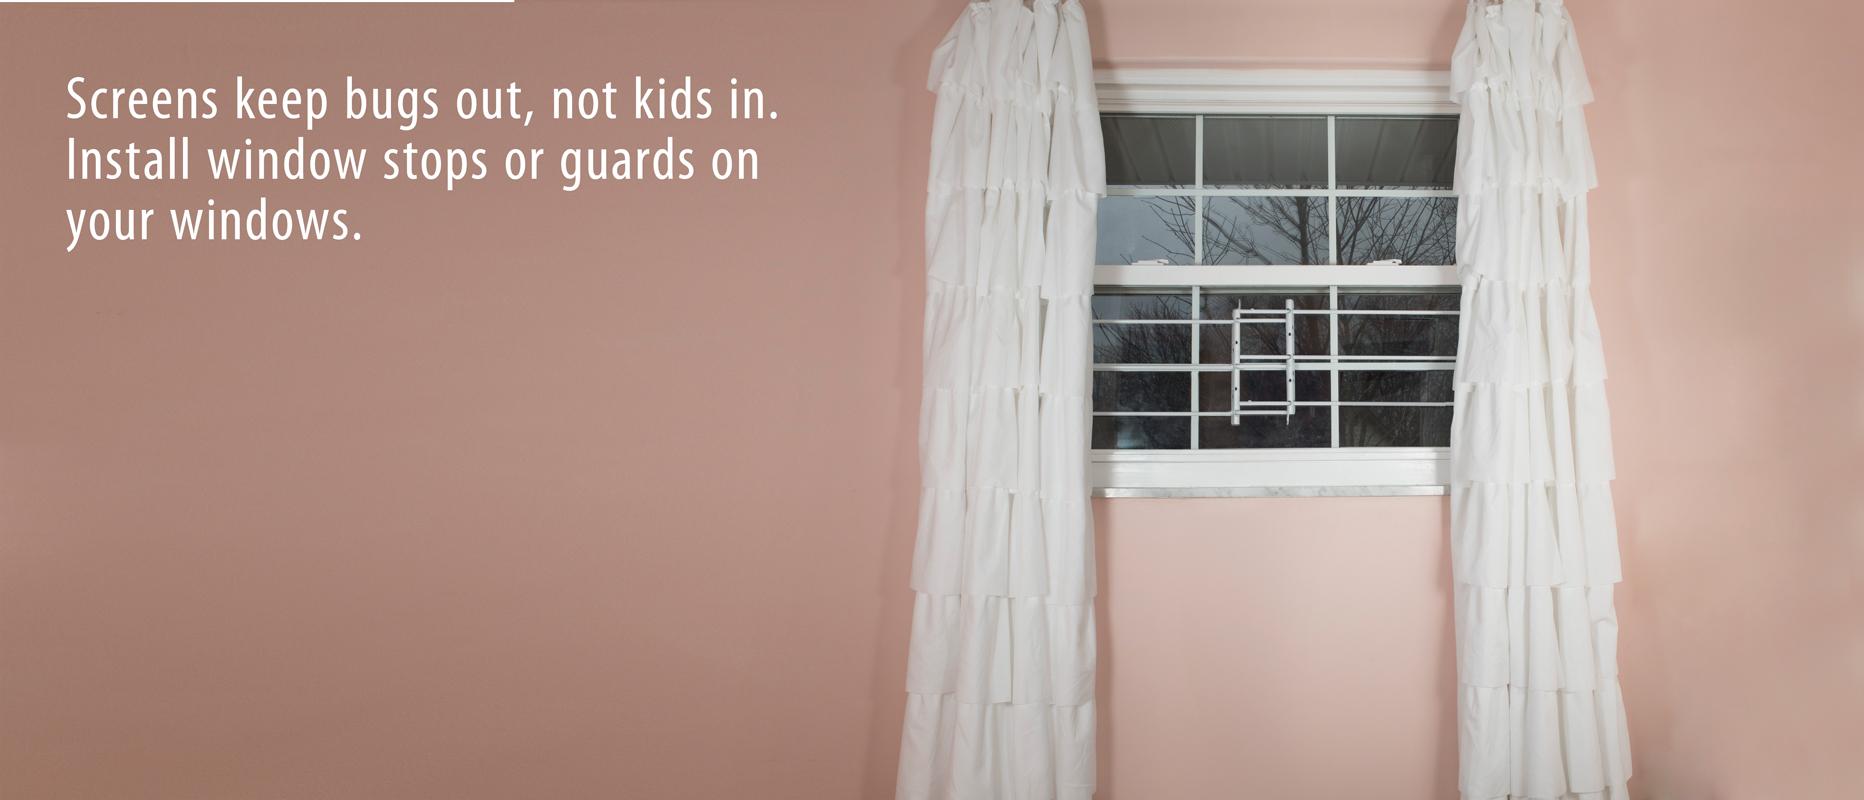 window-guard-fact-graphic.jpg